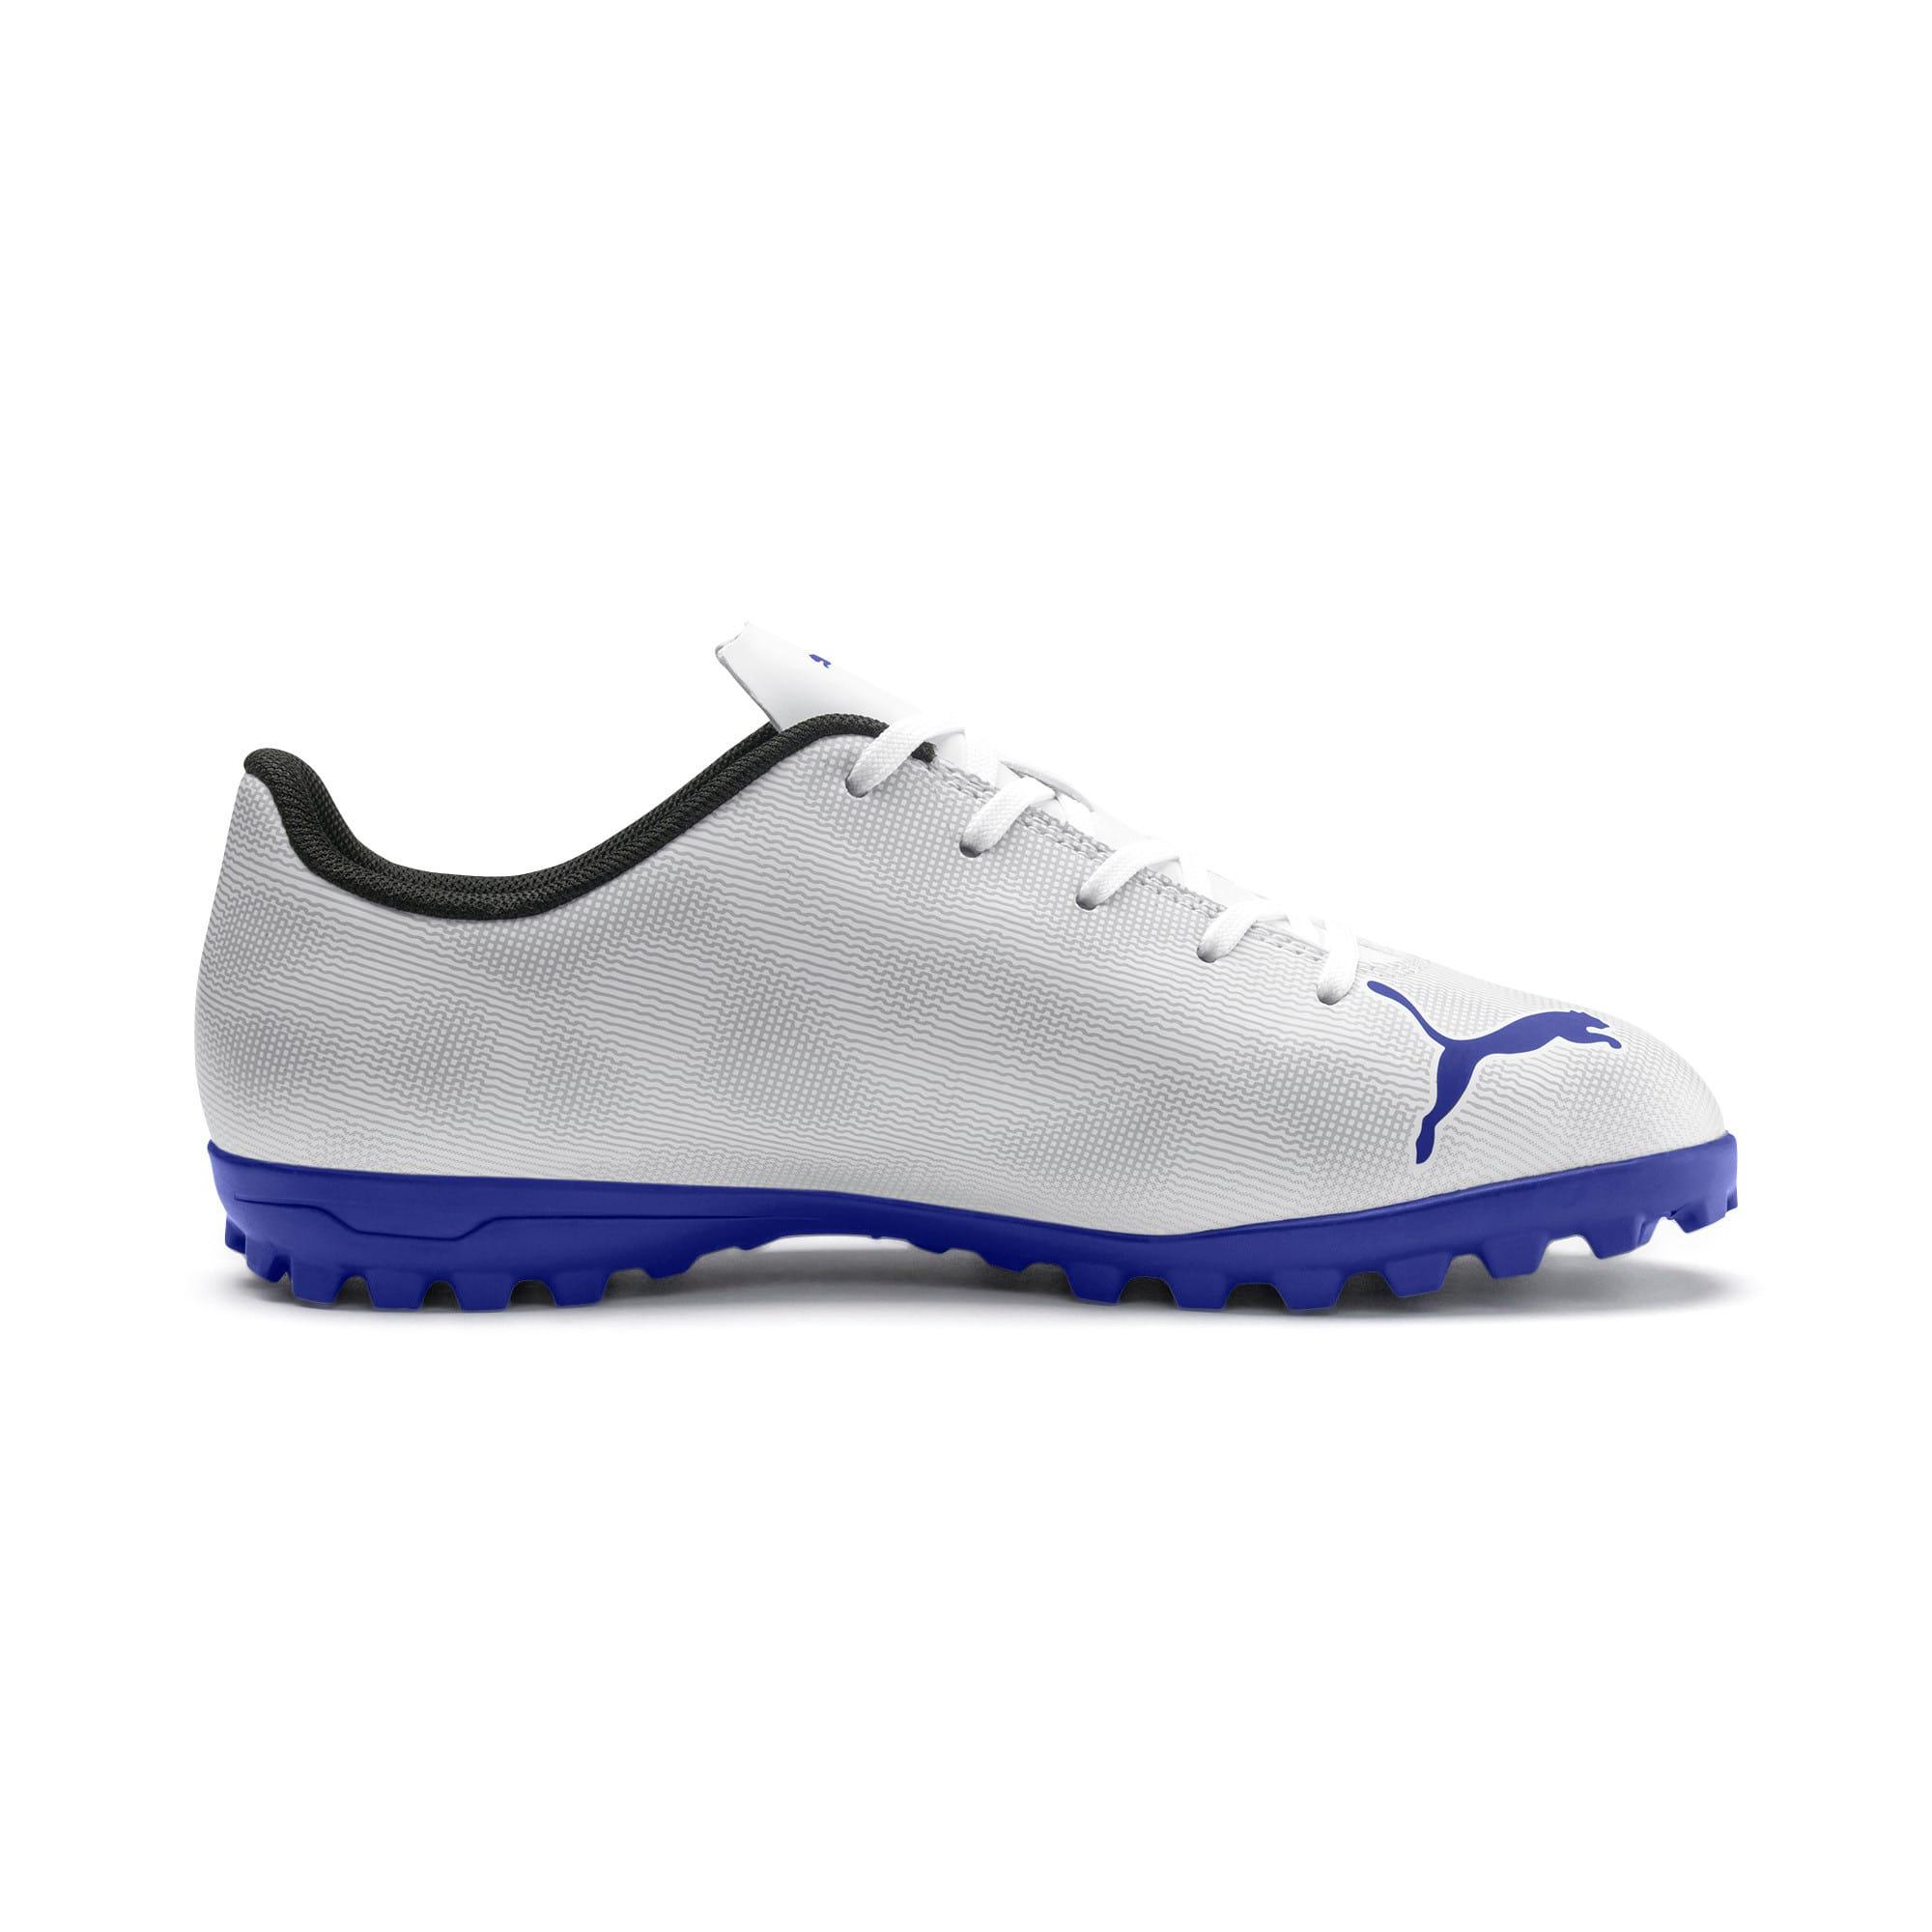 Thumbnail 5 of Rapido TT Boy's Soccer Cleats JR, White-Royal Blue-Light Gray, medium